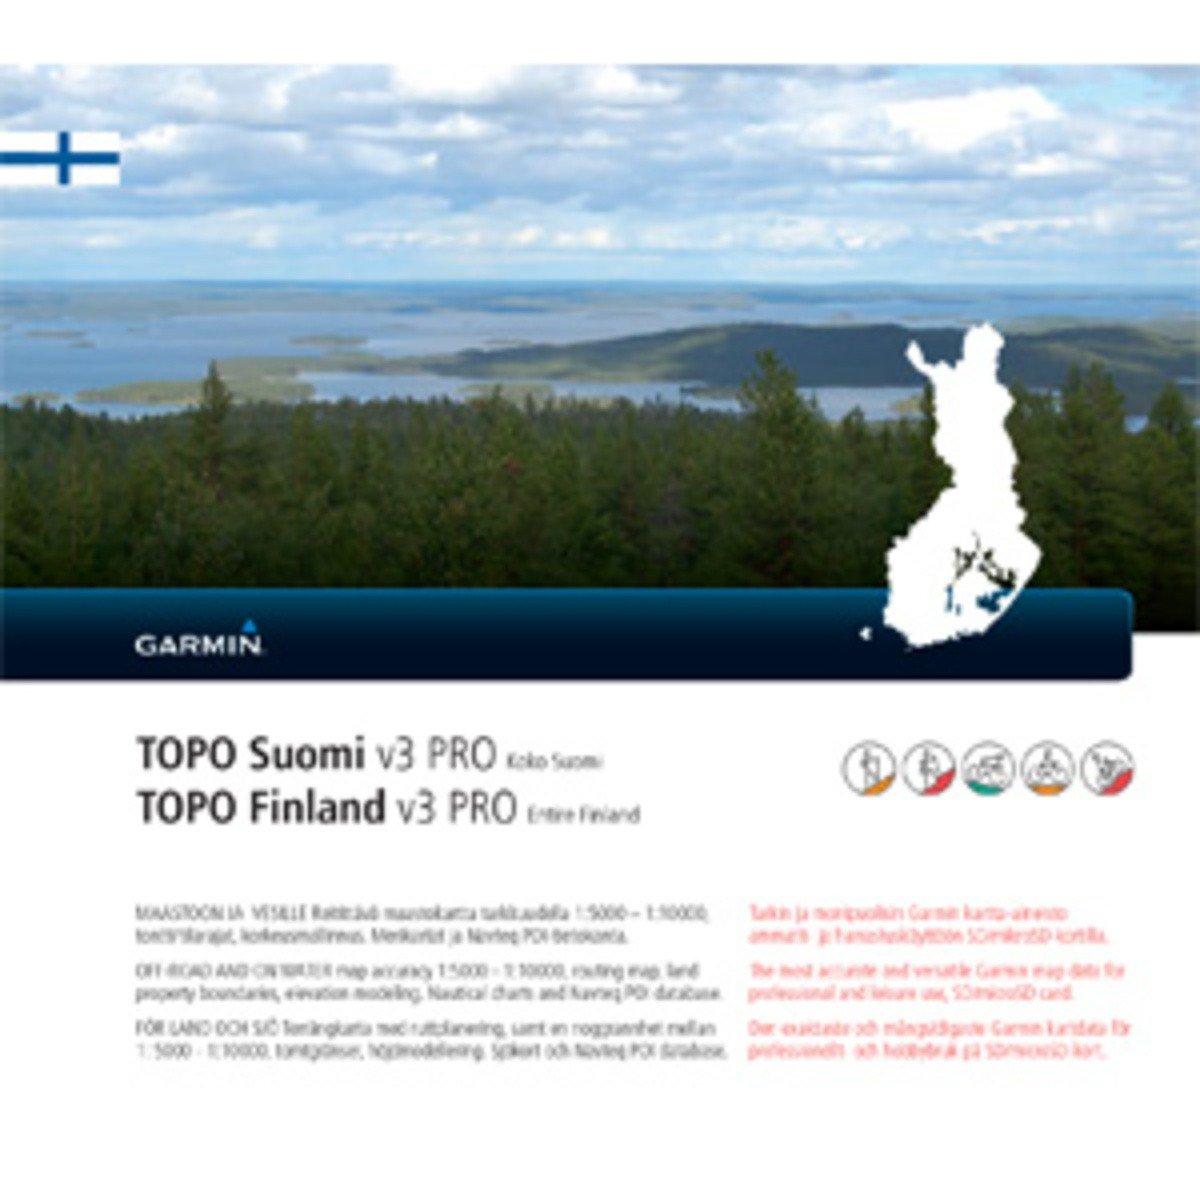 Garmin Topo Finnland v3 PRO MicroSD/SD